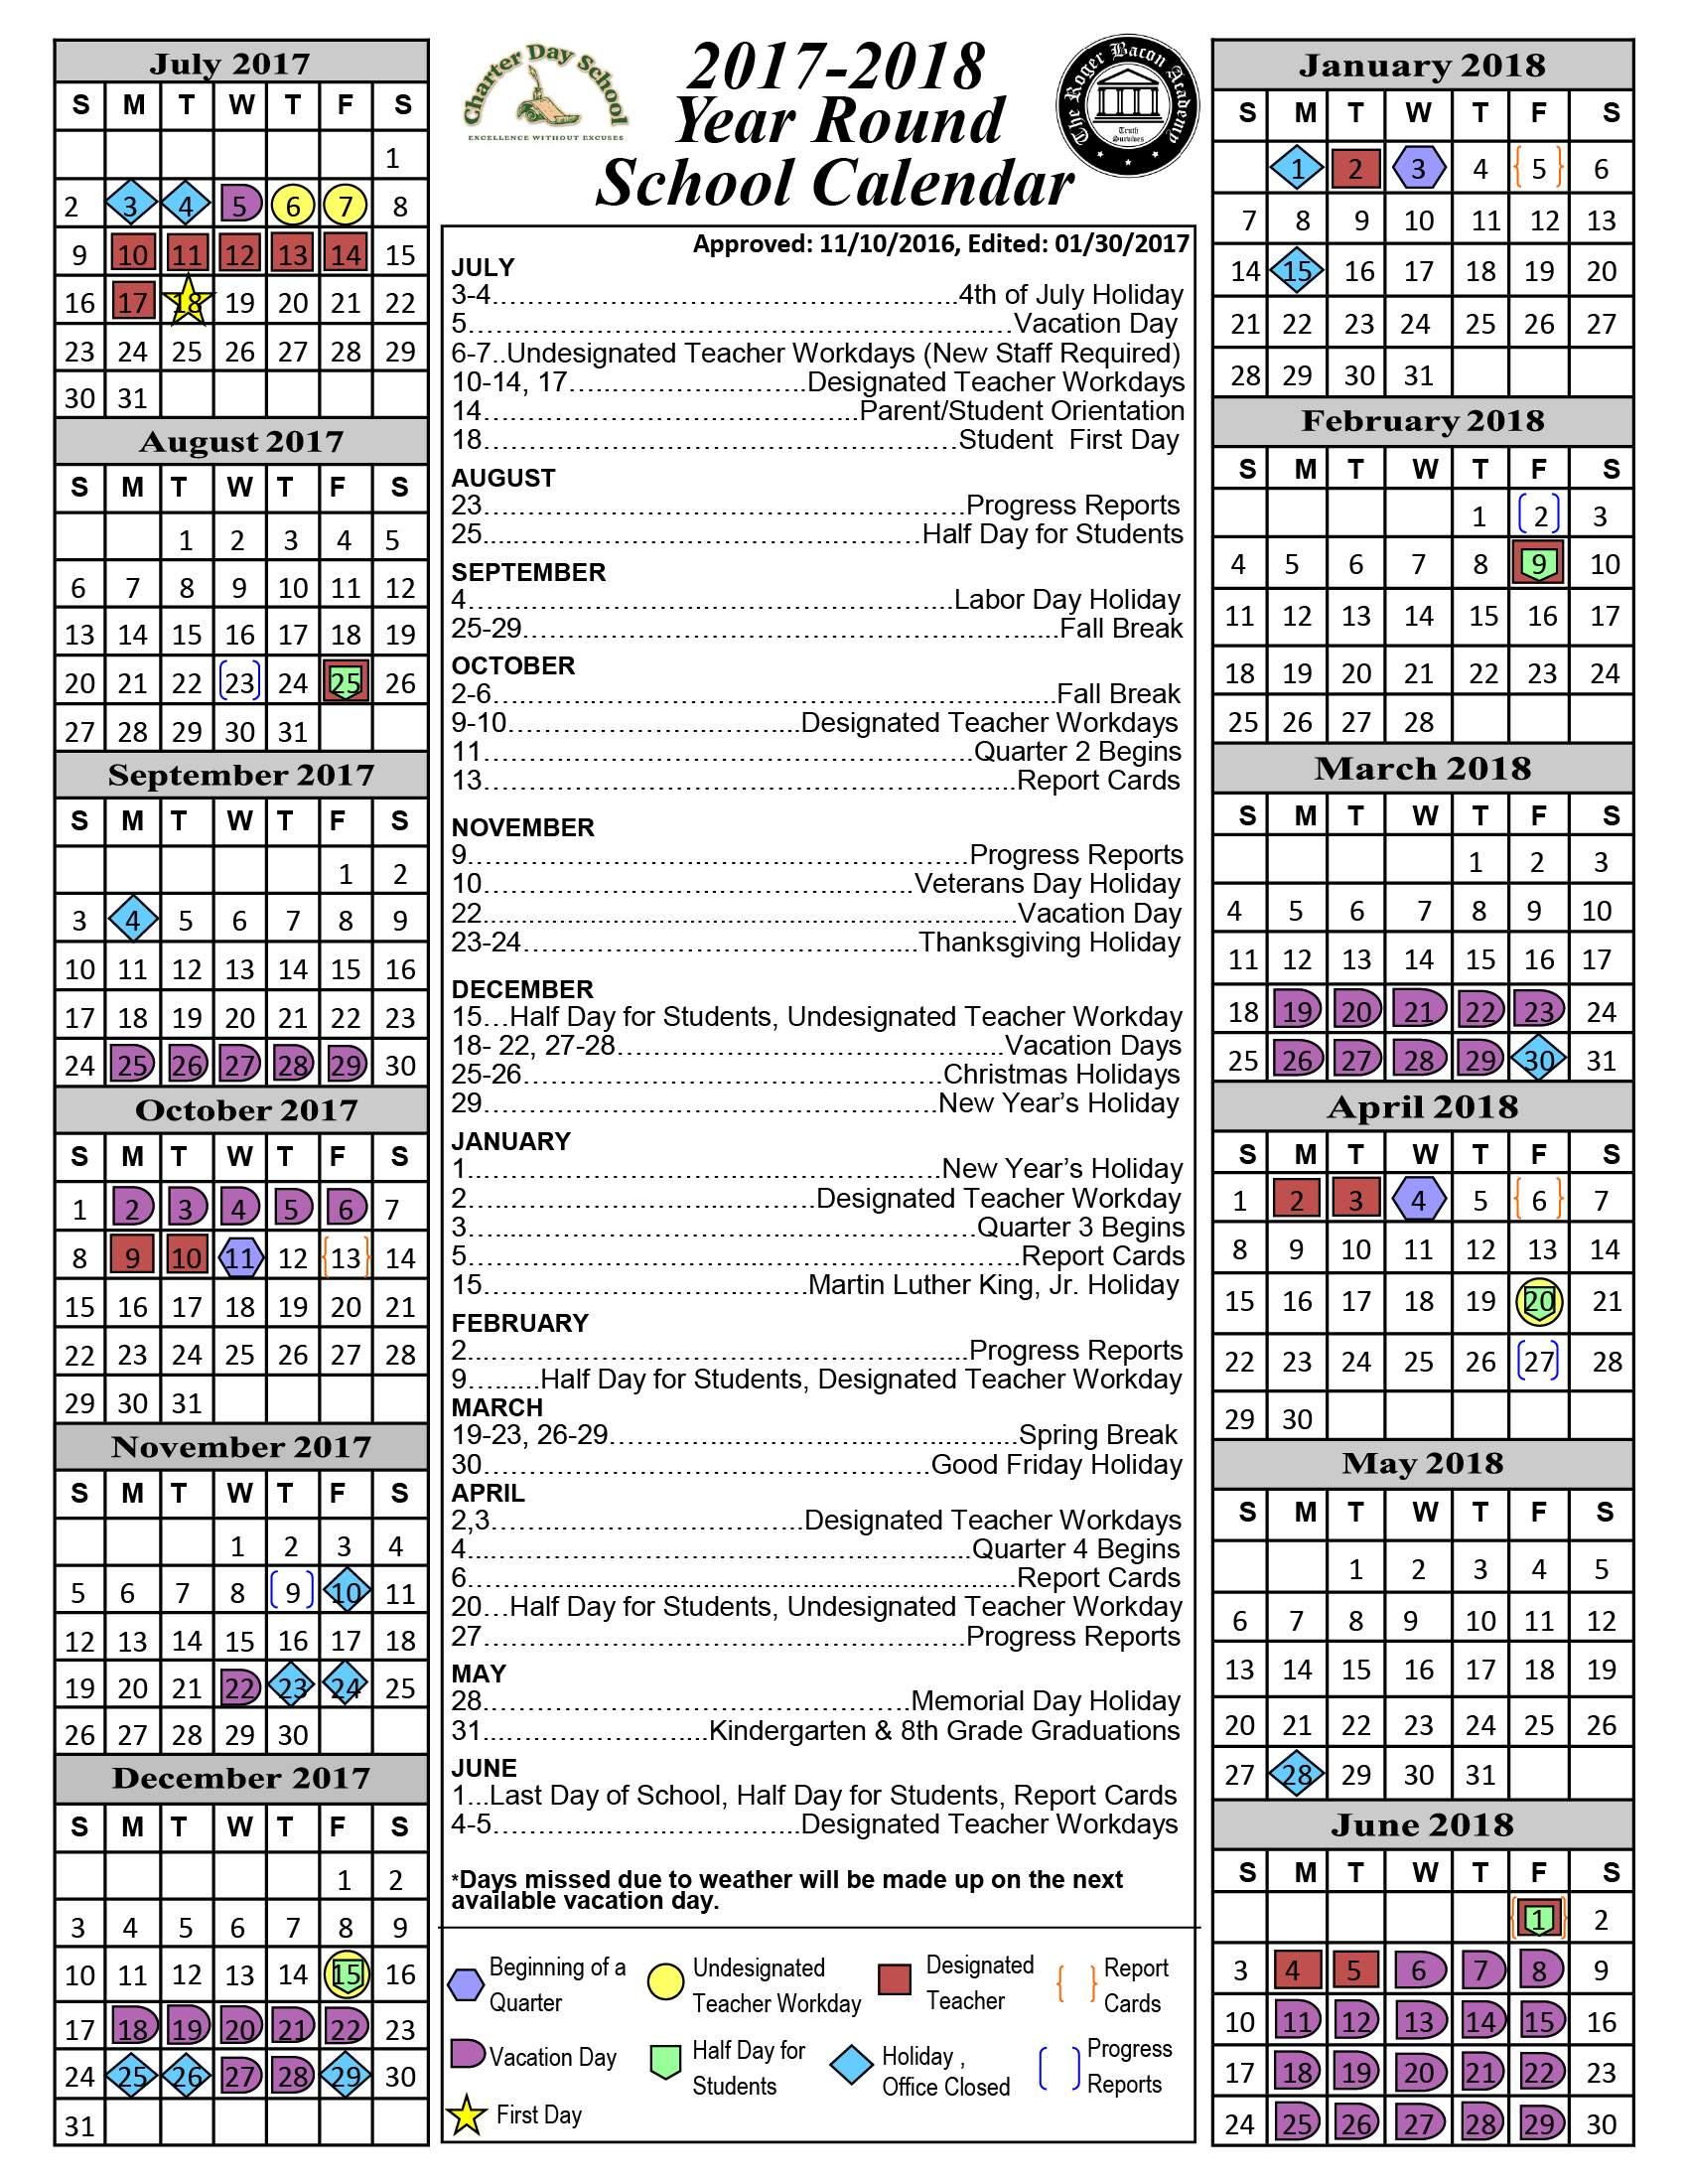 New York School Academic Calendar New York Law School Calendar 171; Charter Day School